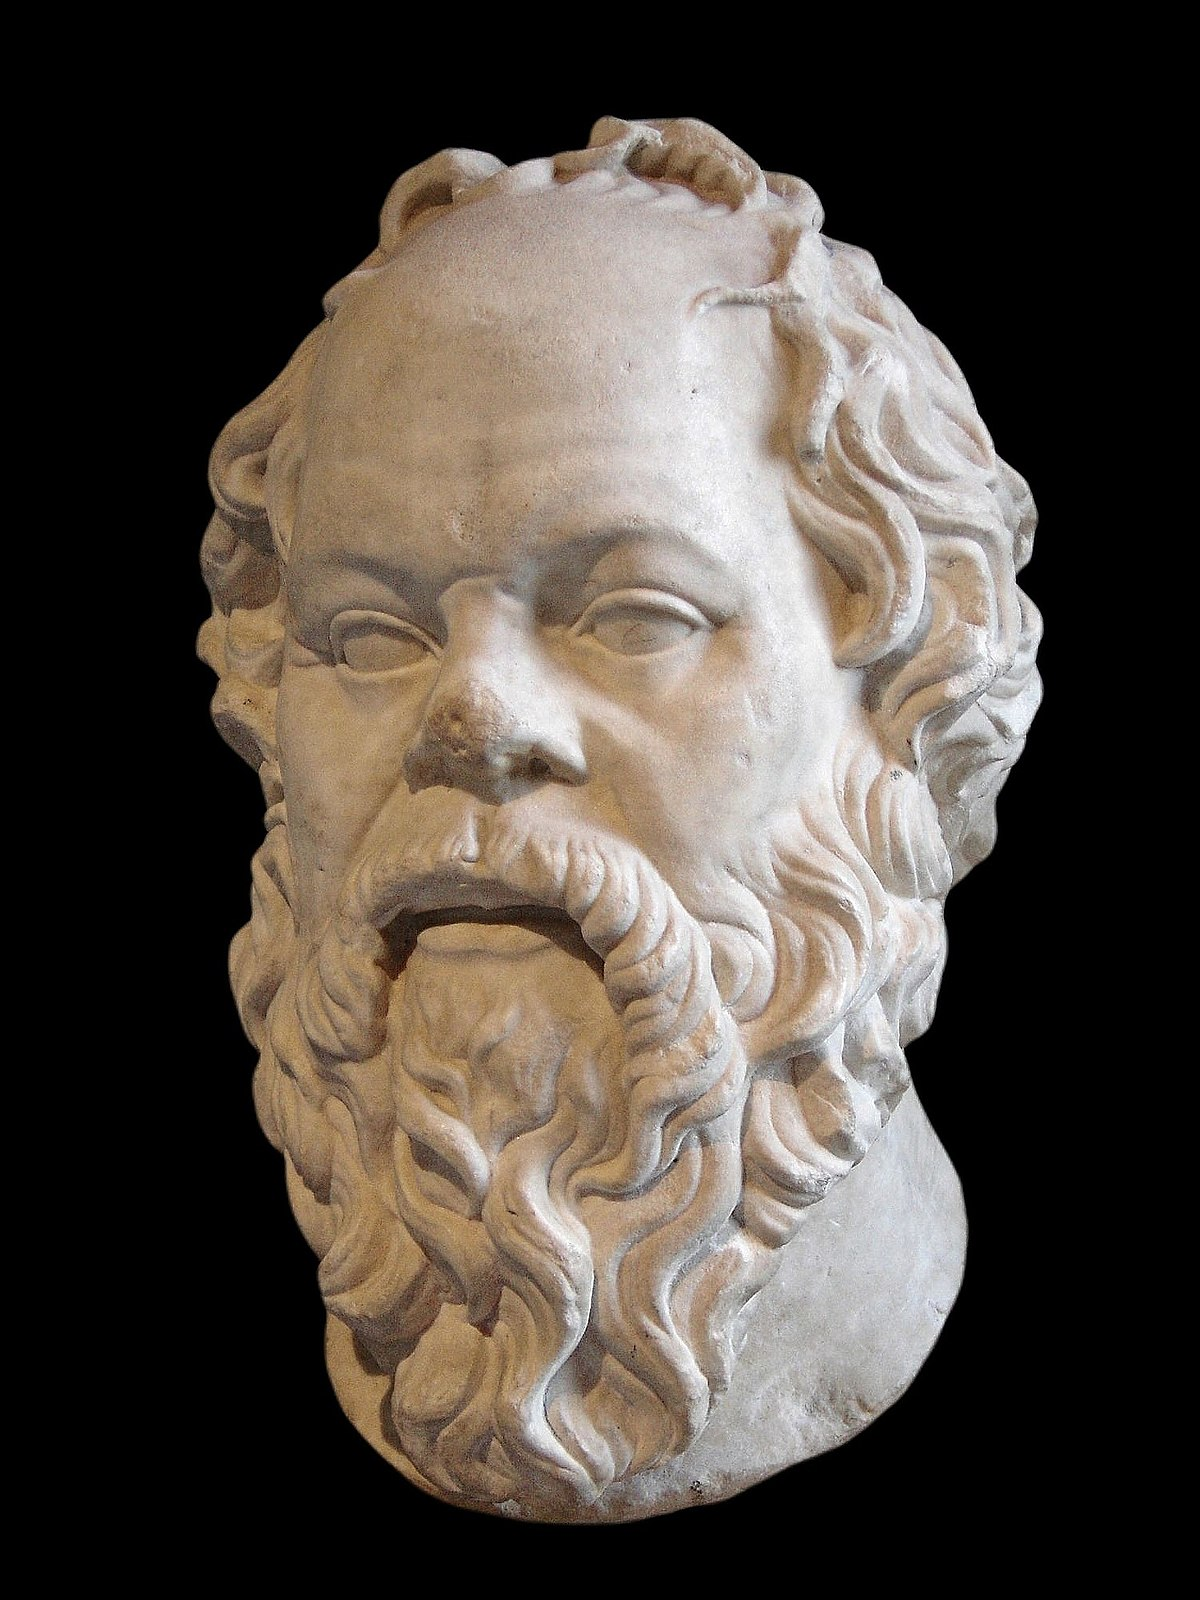 Socrates - Wikipedia